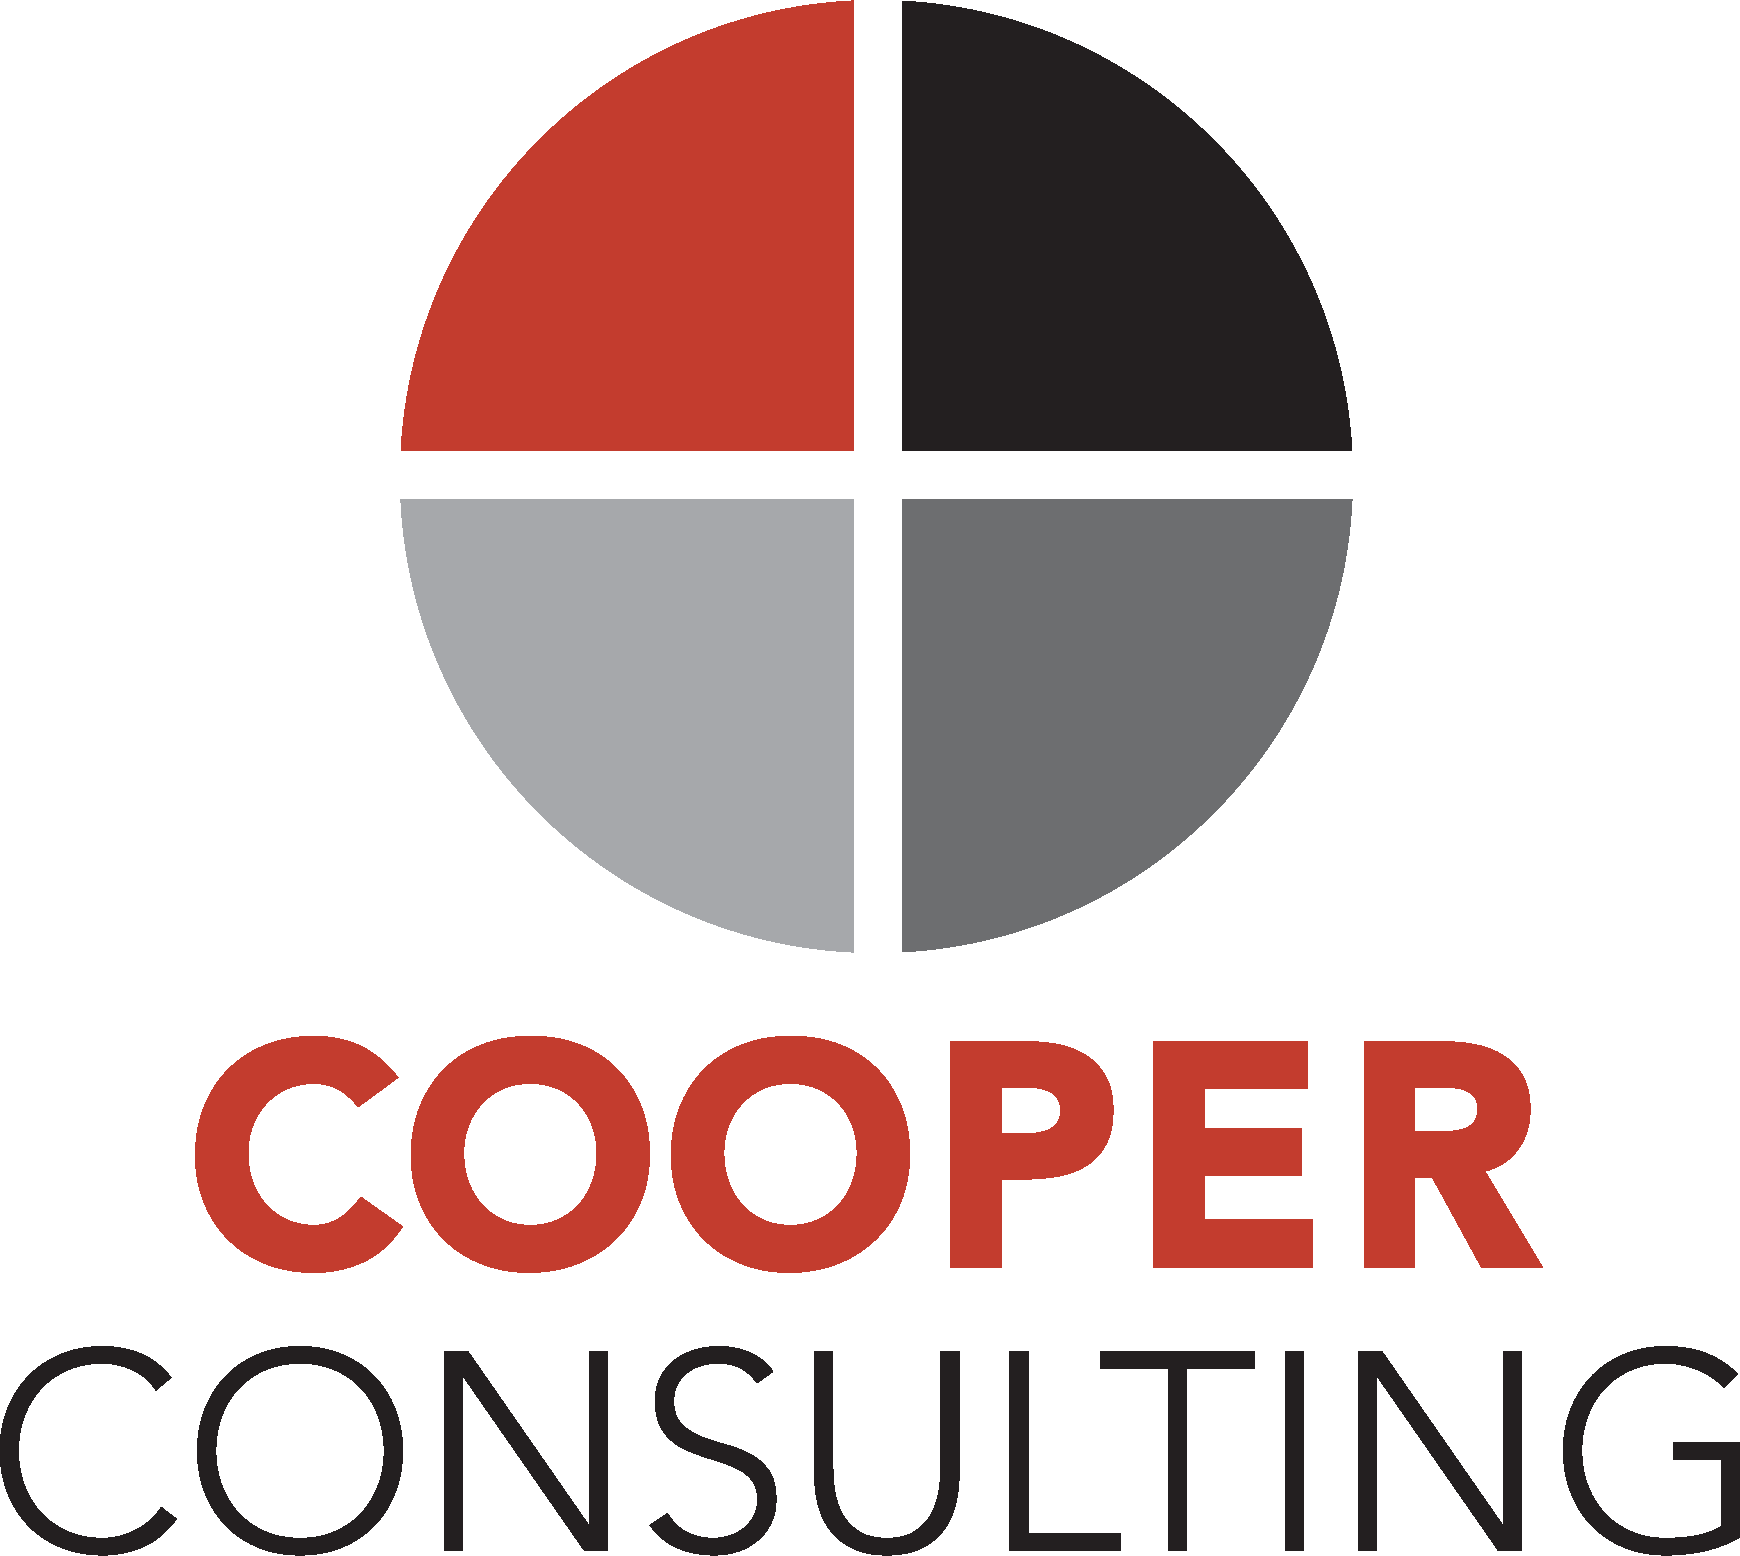 Cooper Consulting